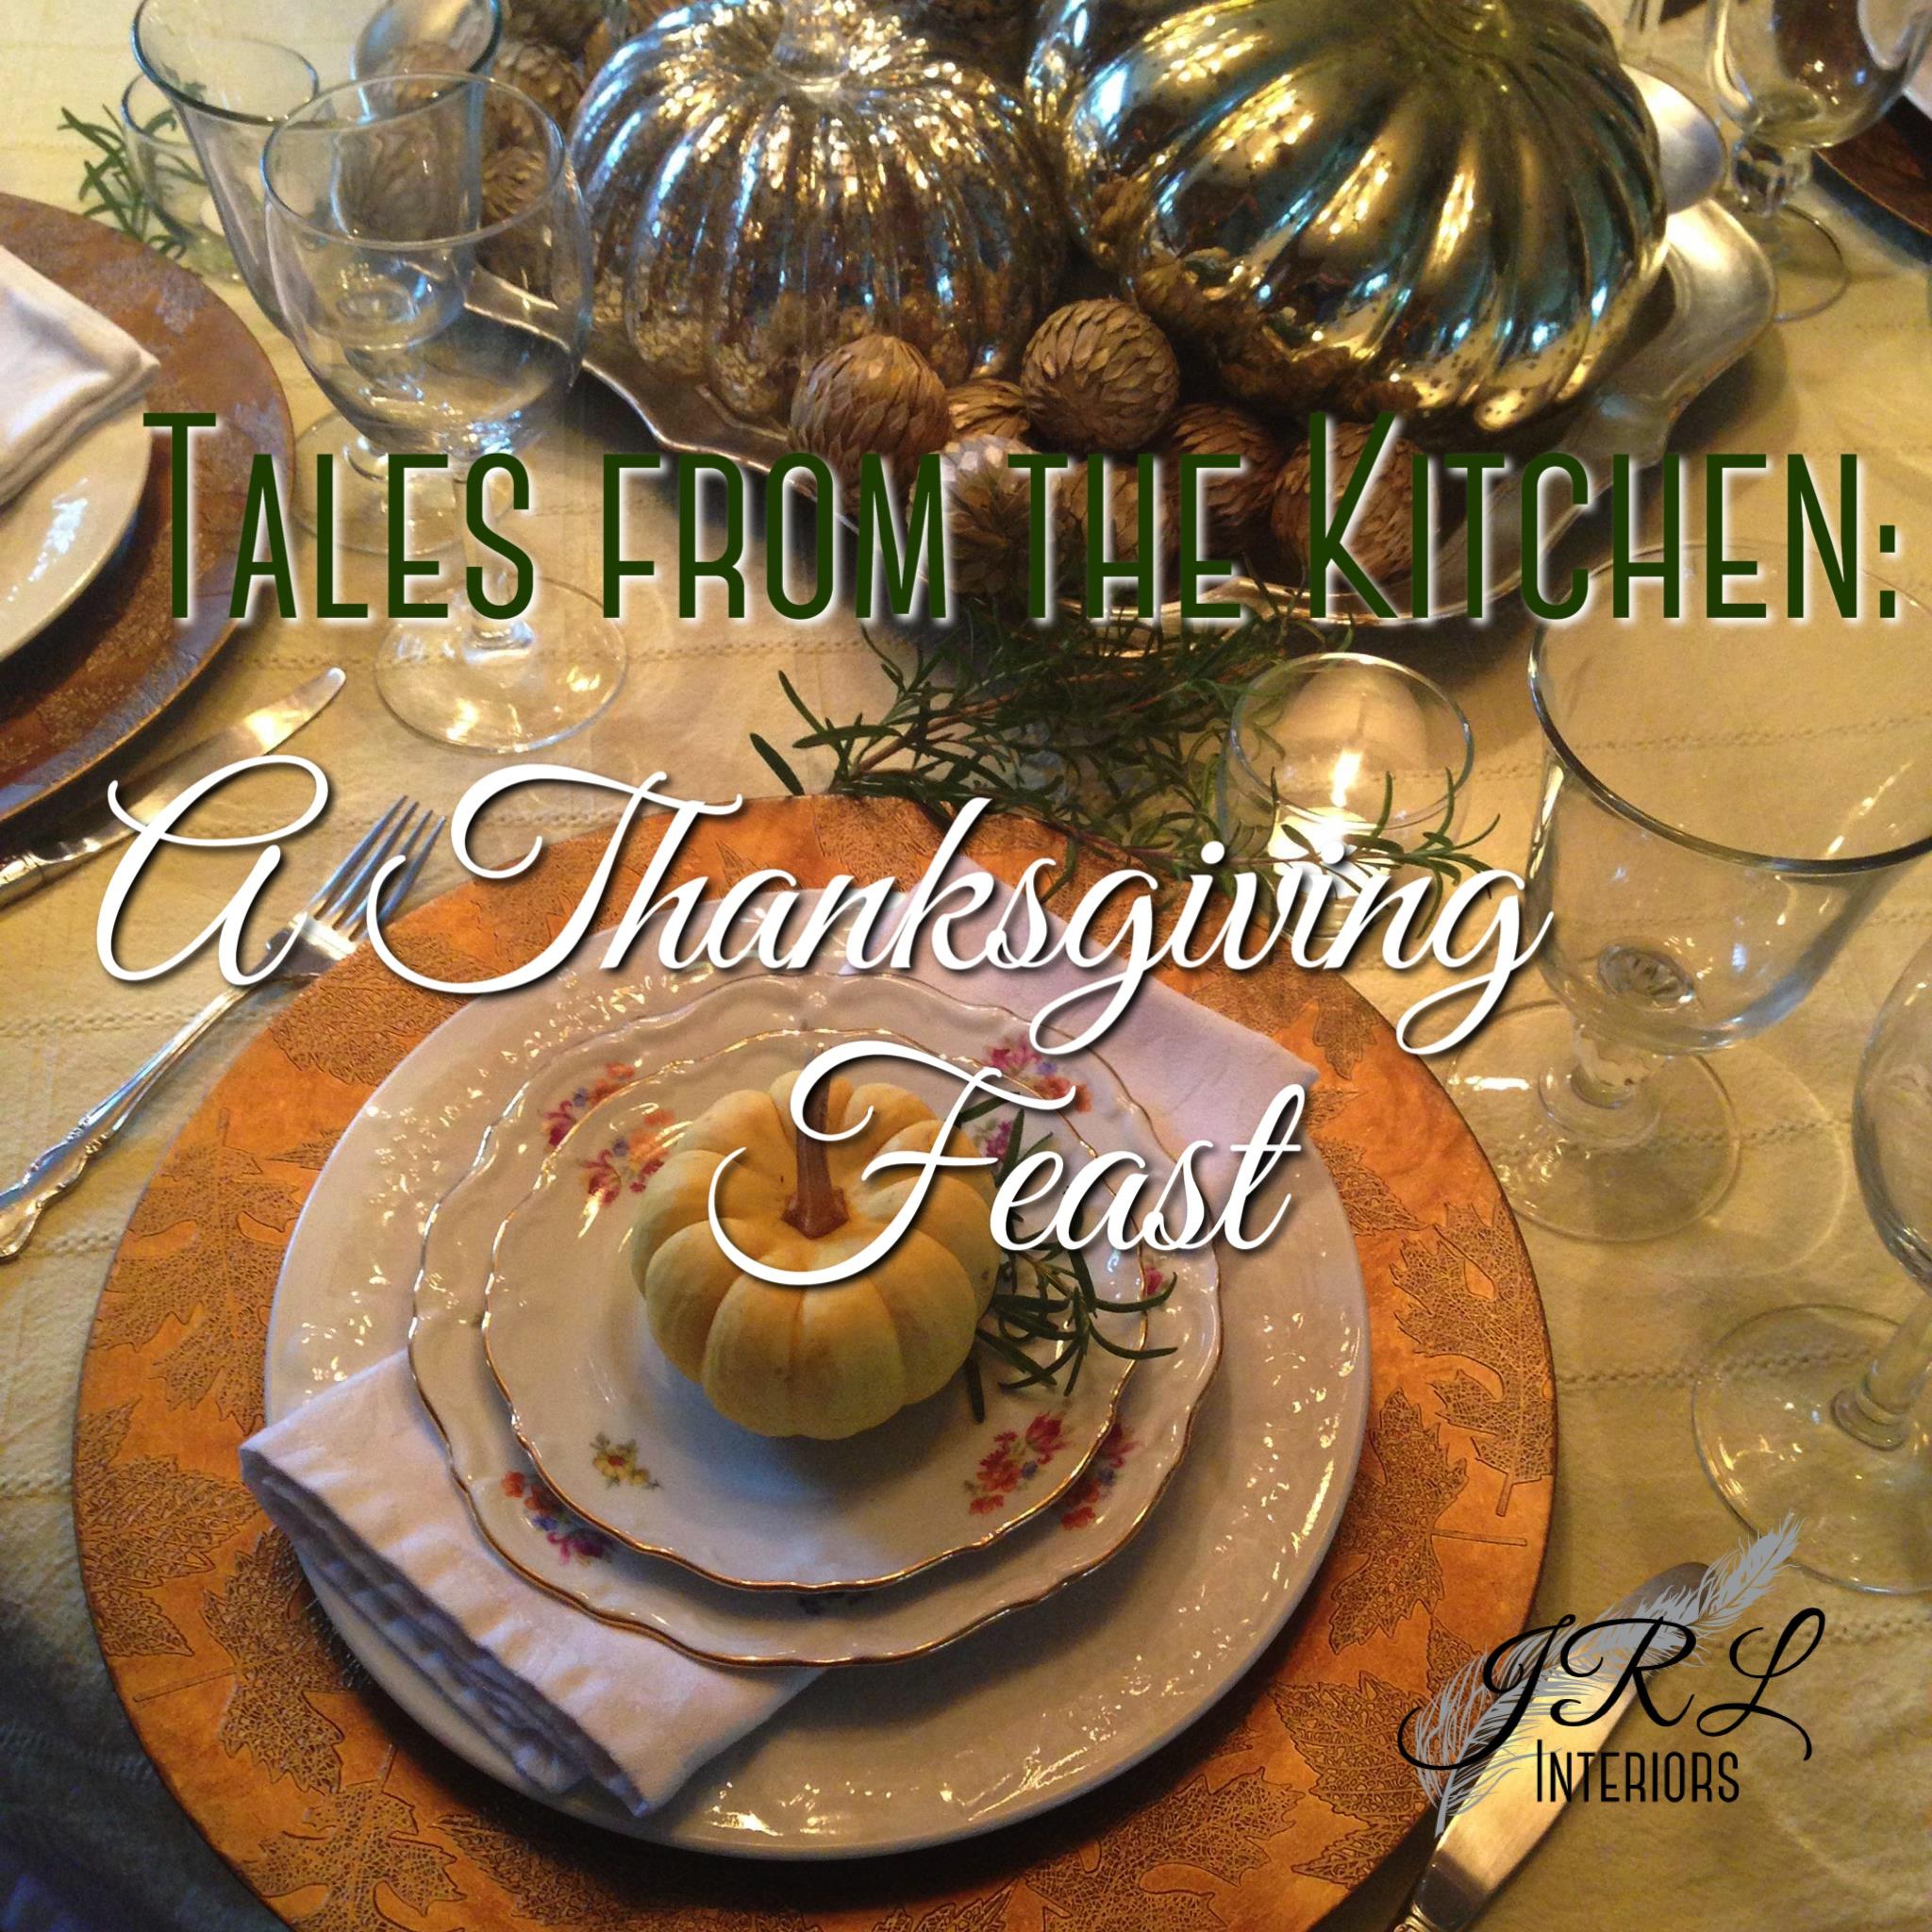 A-Thanksgiving-Feast.jpg